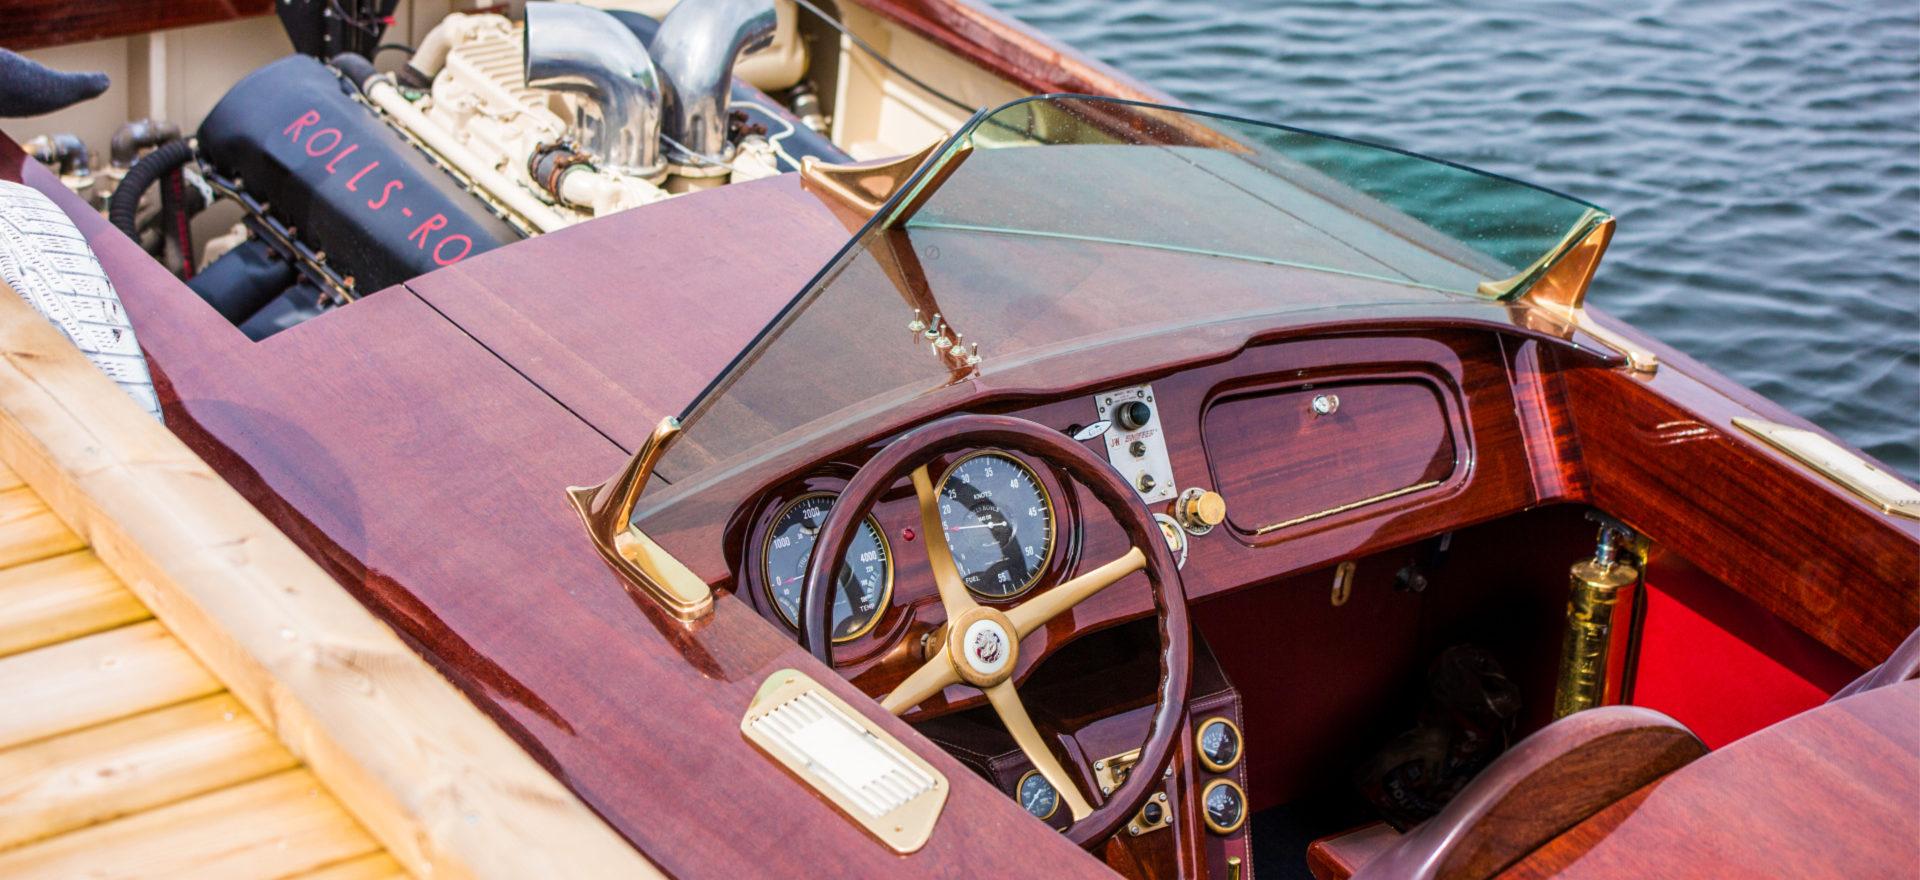 G5 boat_PRINT-7224